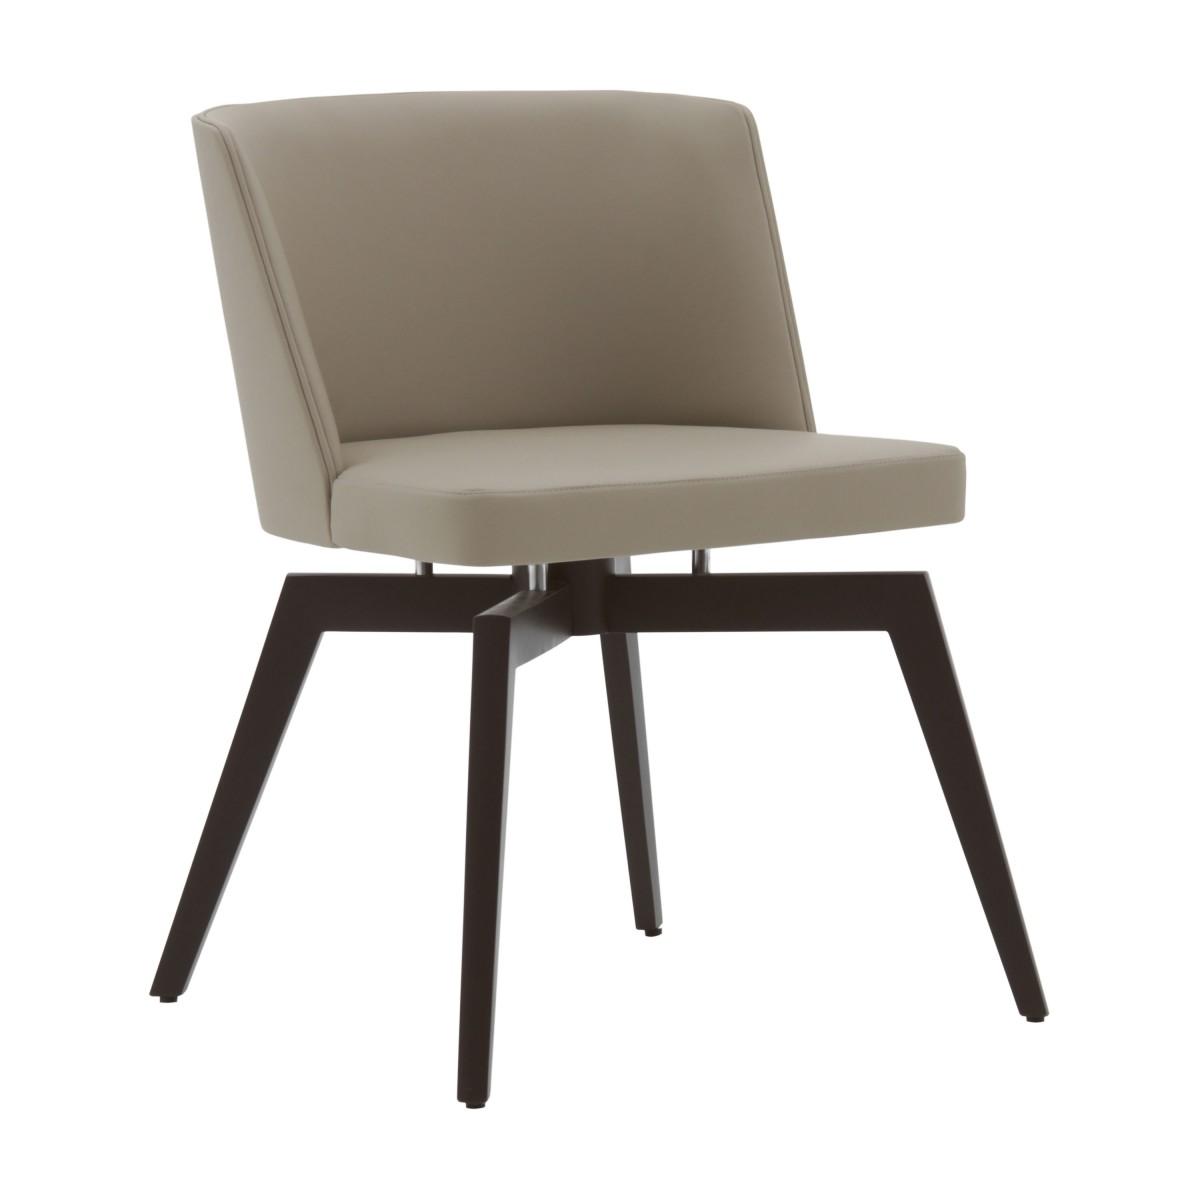 italian modern chair marta 3238